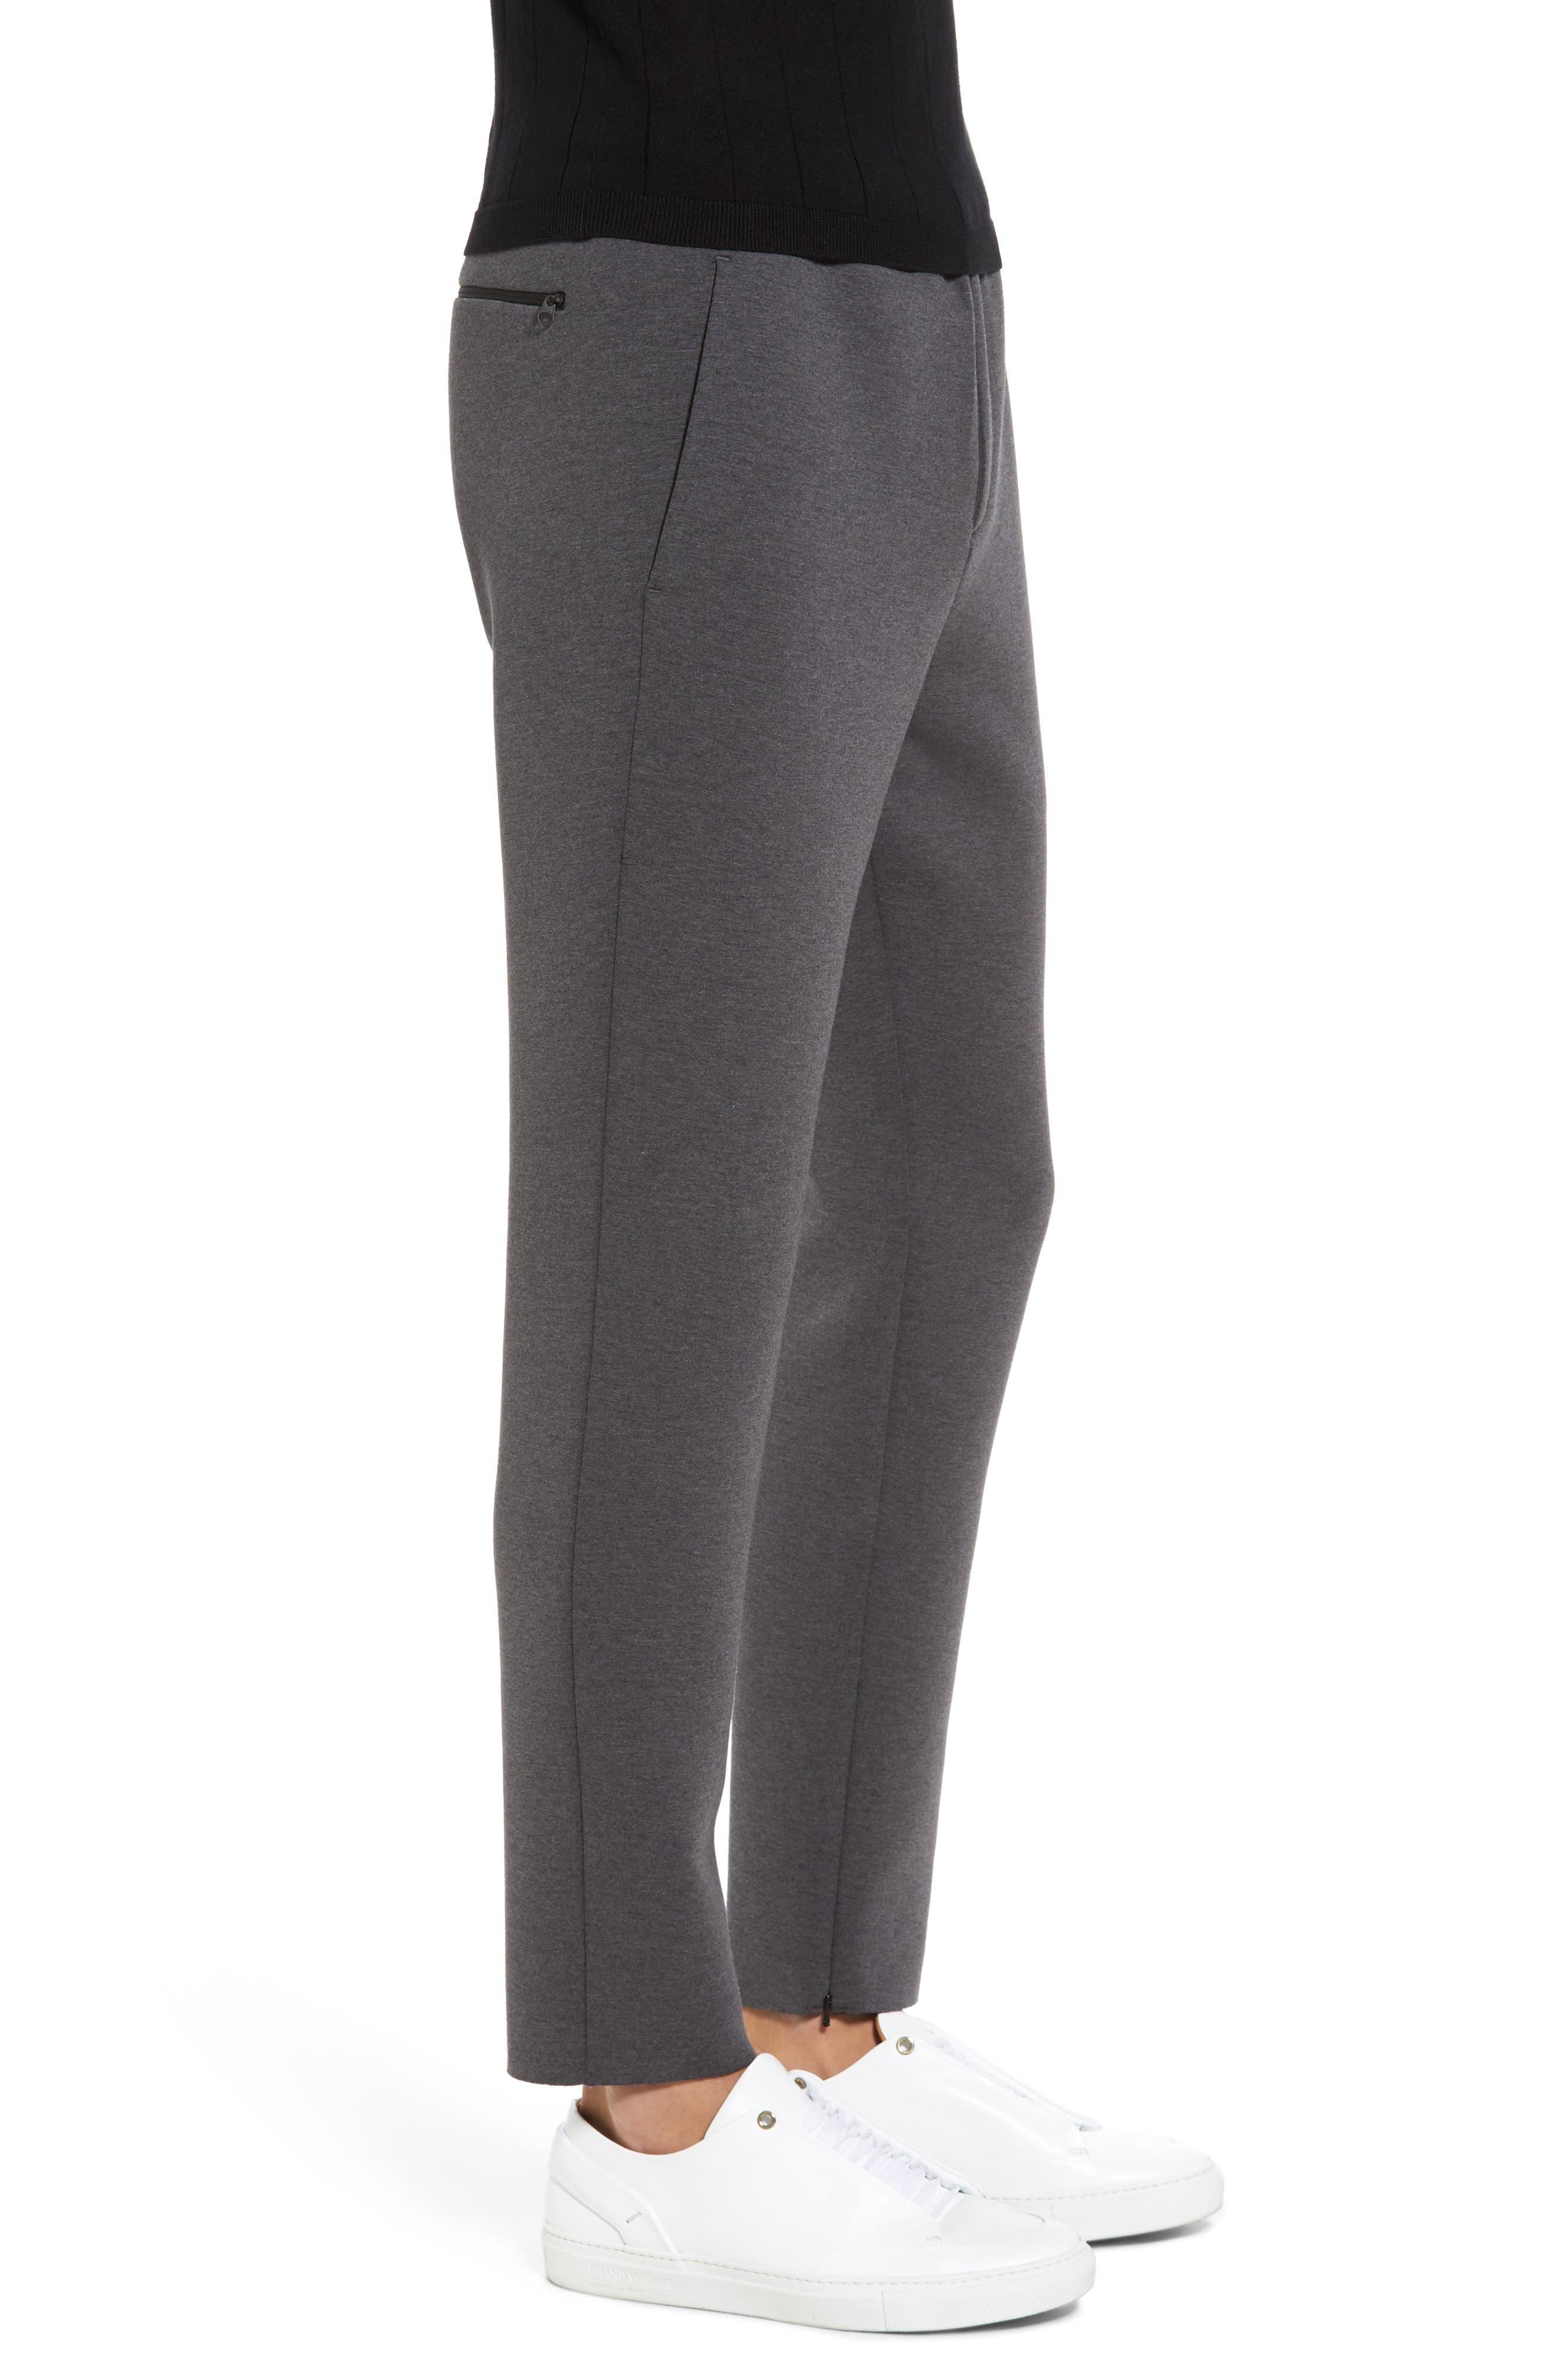 Knit Lounge Pants,                             Alternate thumbnail 3, color,                             Charcoal Heather